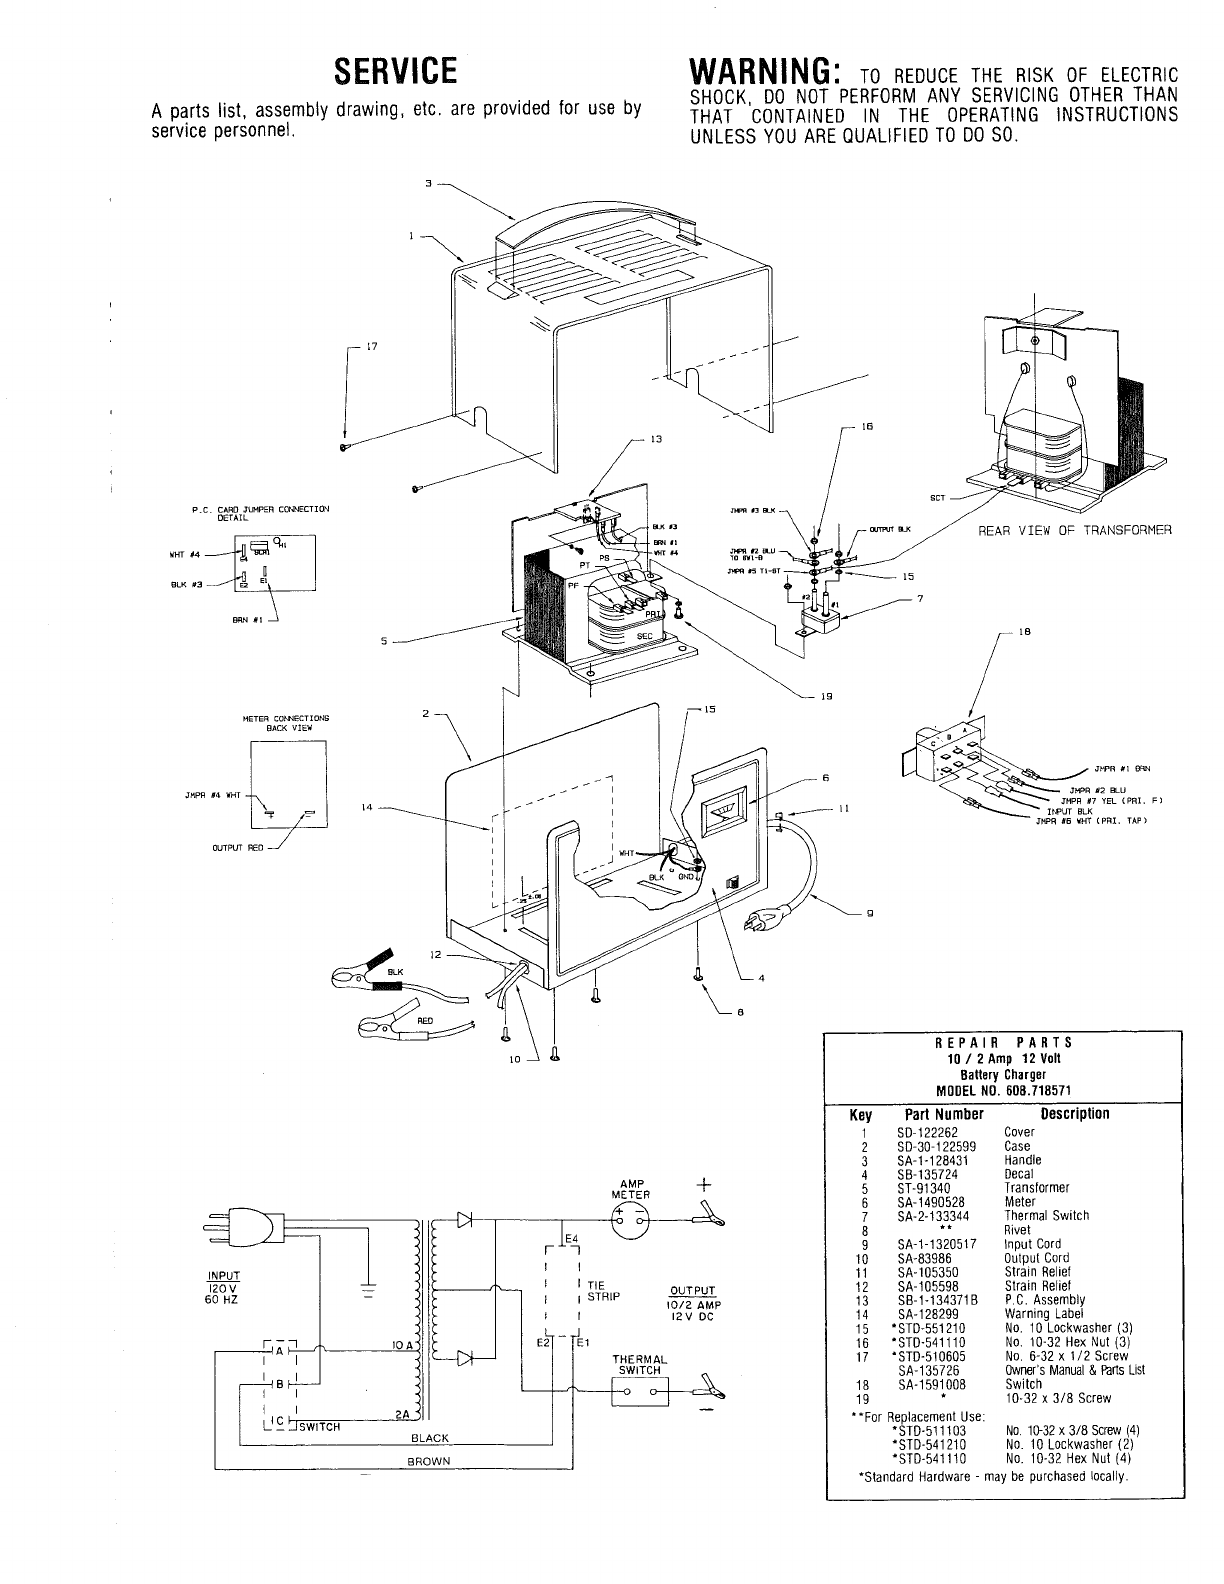 Diagram 1975 Sears 186 Wiring Diagram Full Version Hd Quality Wiring Diagram Timediagram Pizzagege Fr